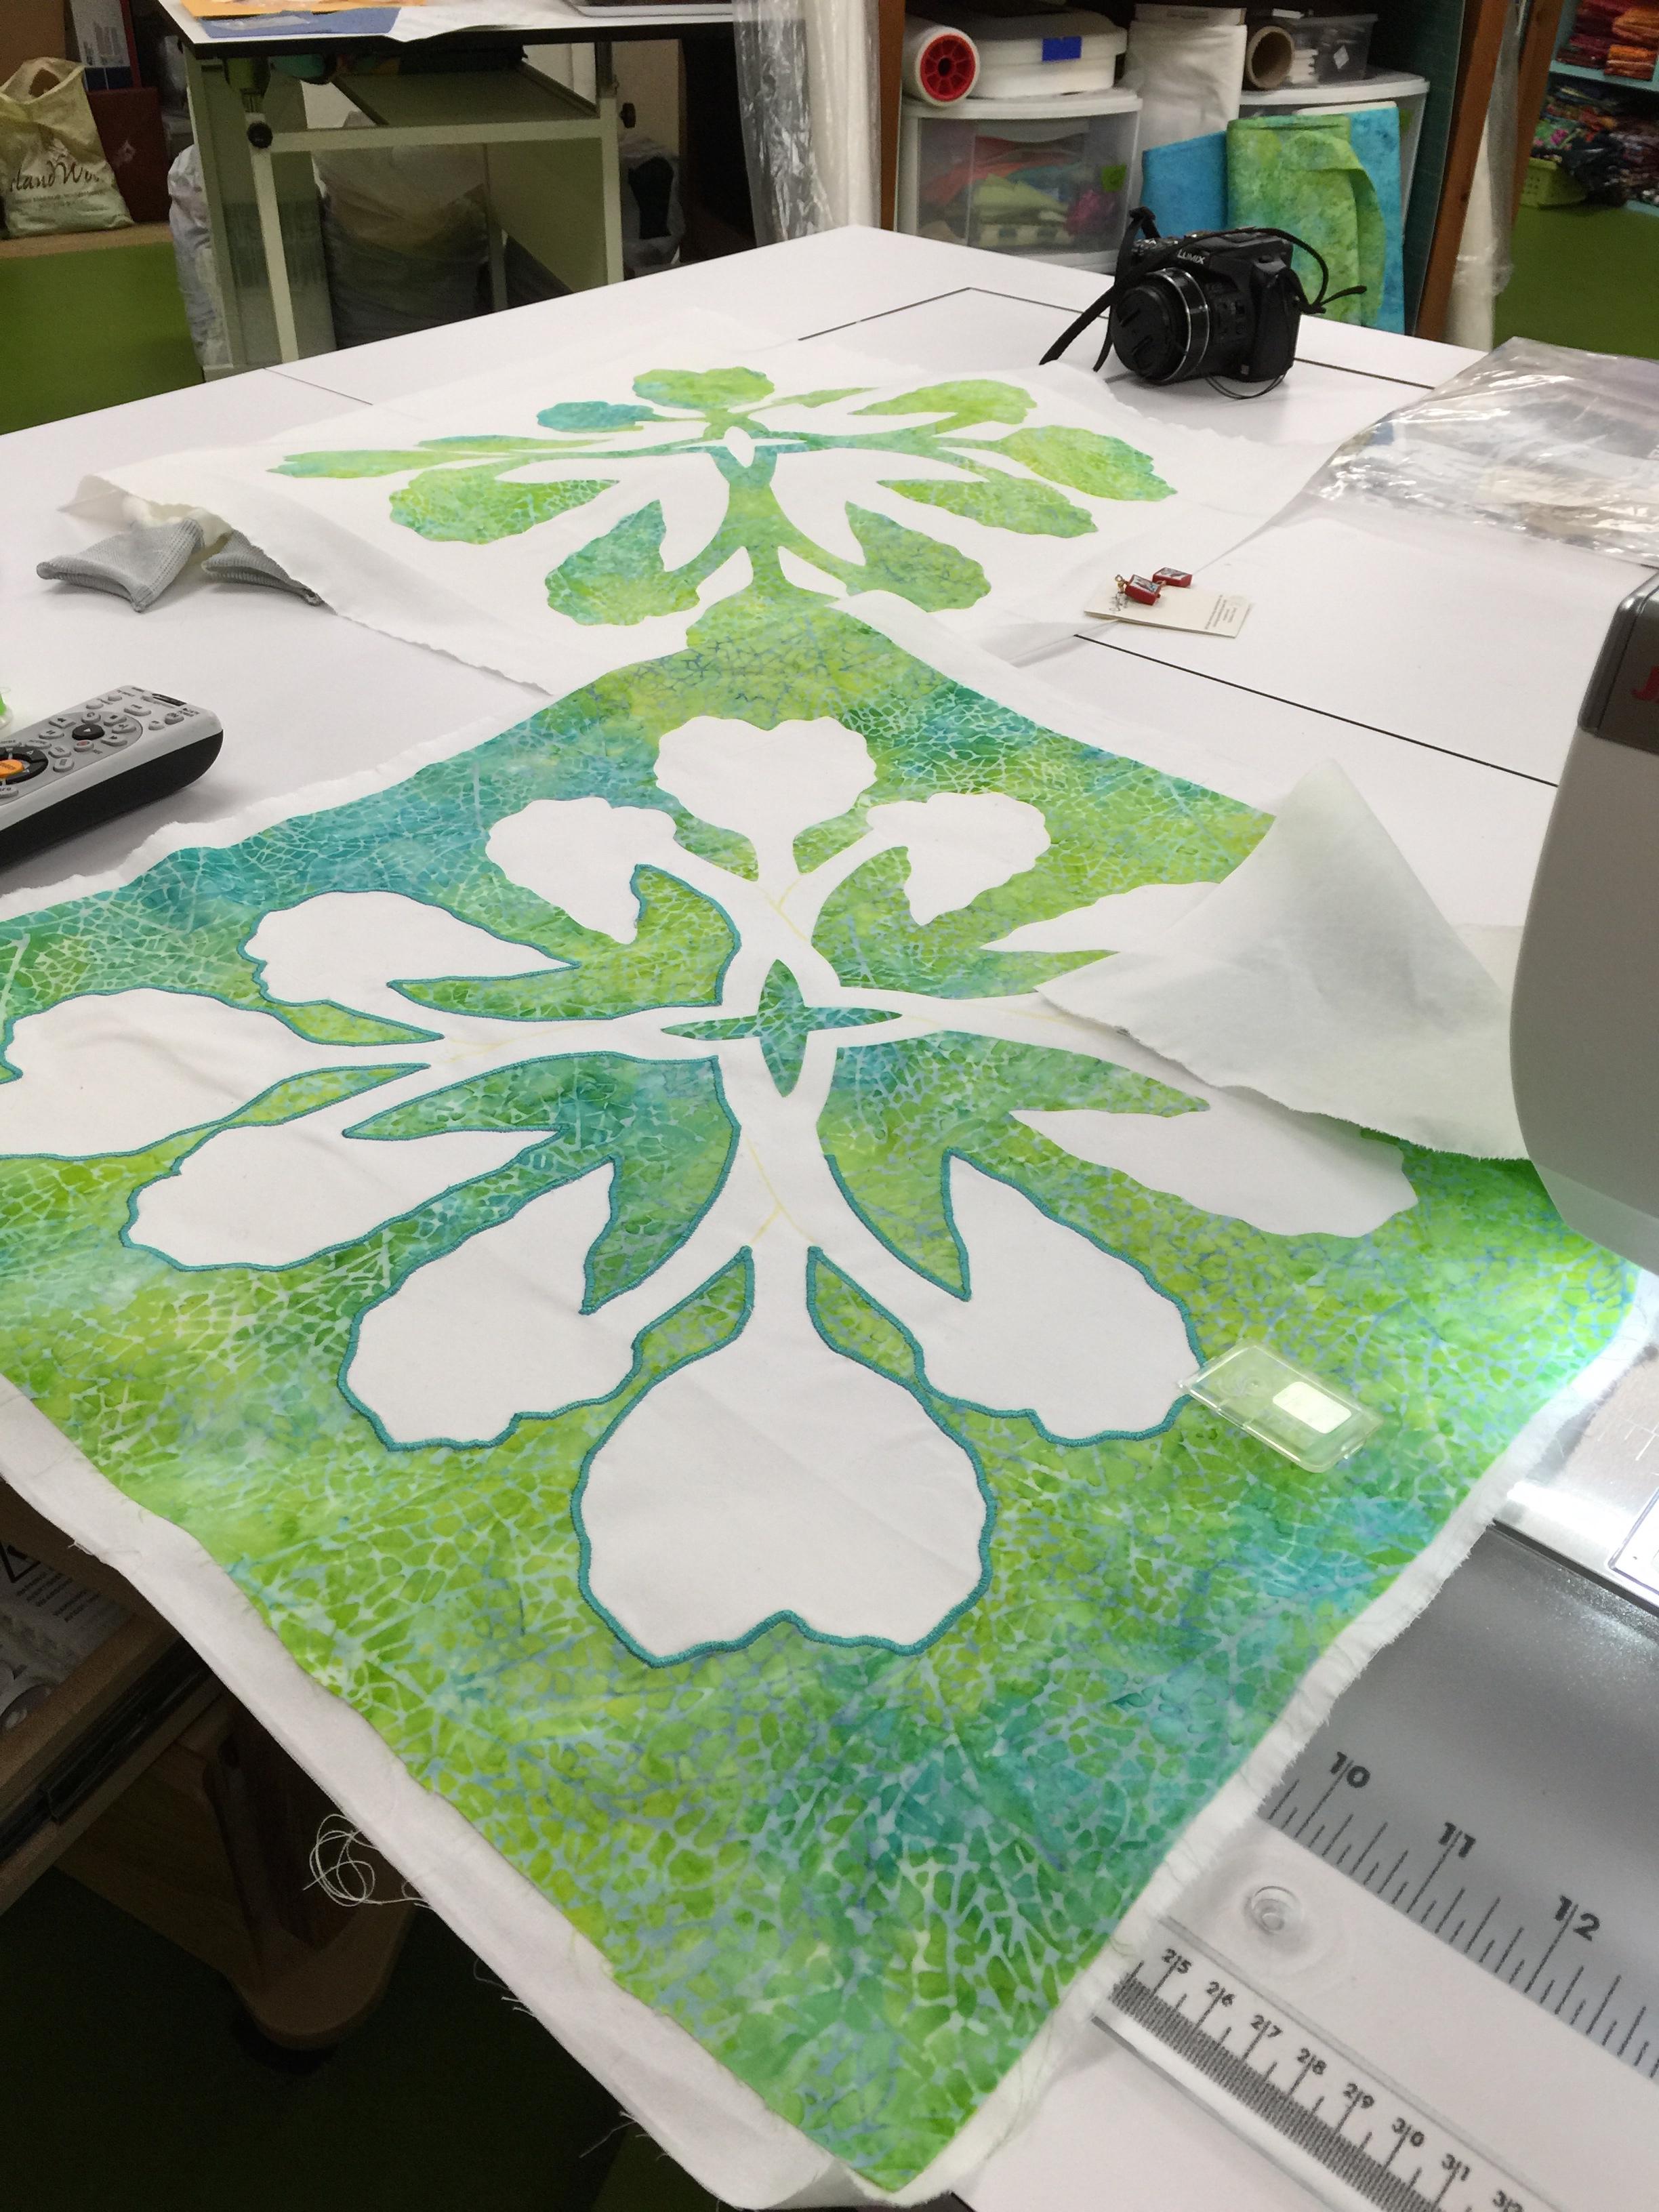 Applique designs for tablecloth -  C Sarah Ann Smith Fused Applique Satin Stitched